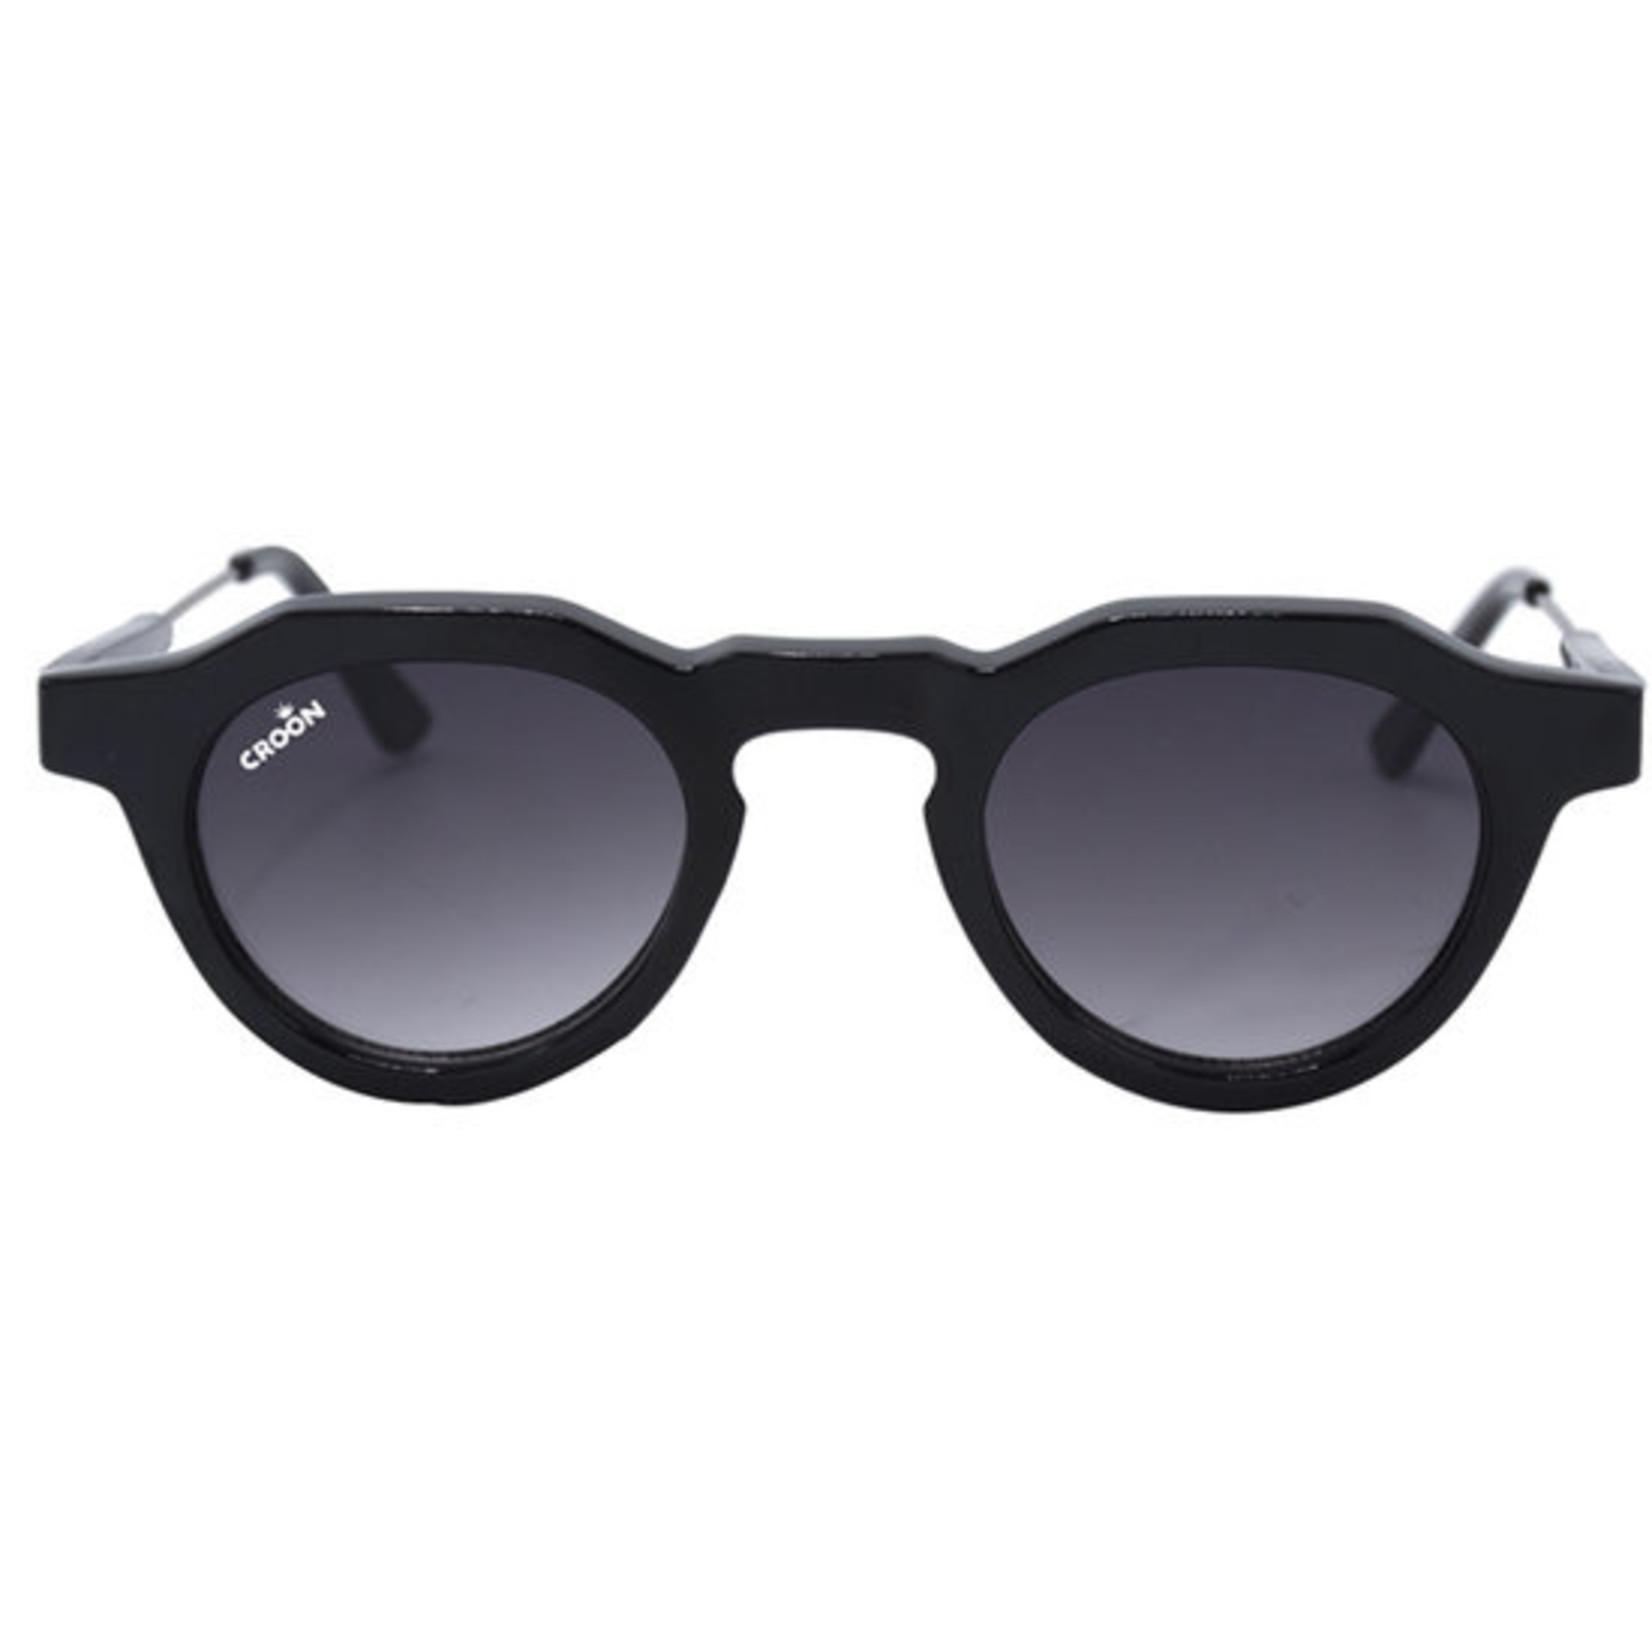 Croon Tailor Shiny Black zonnebril